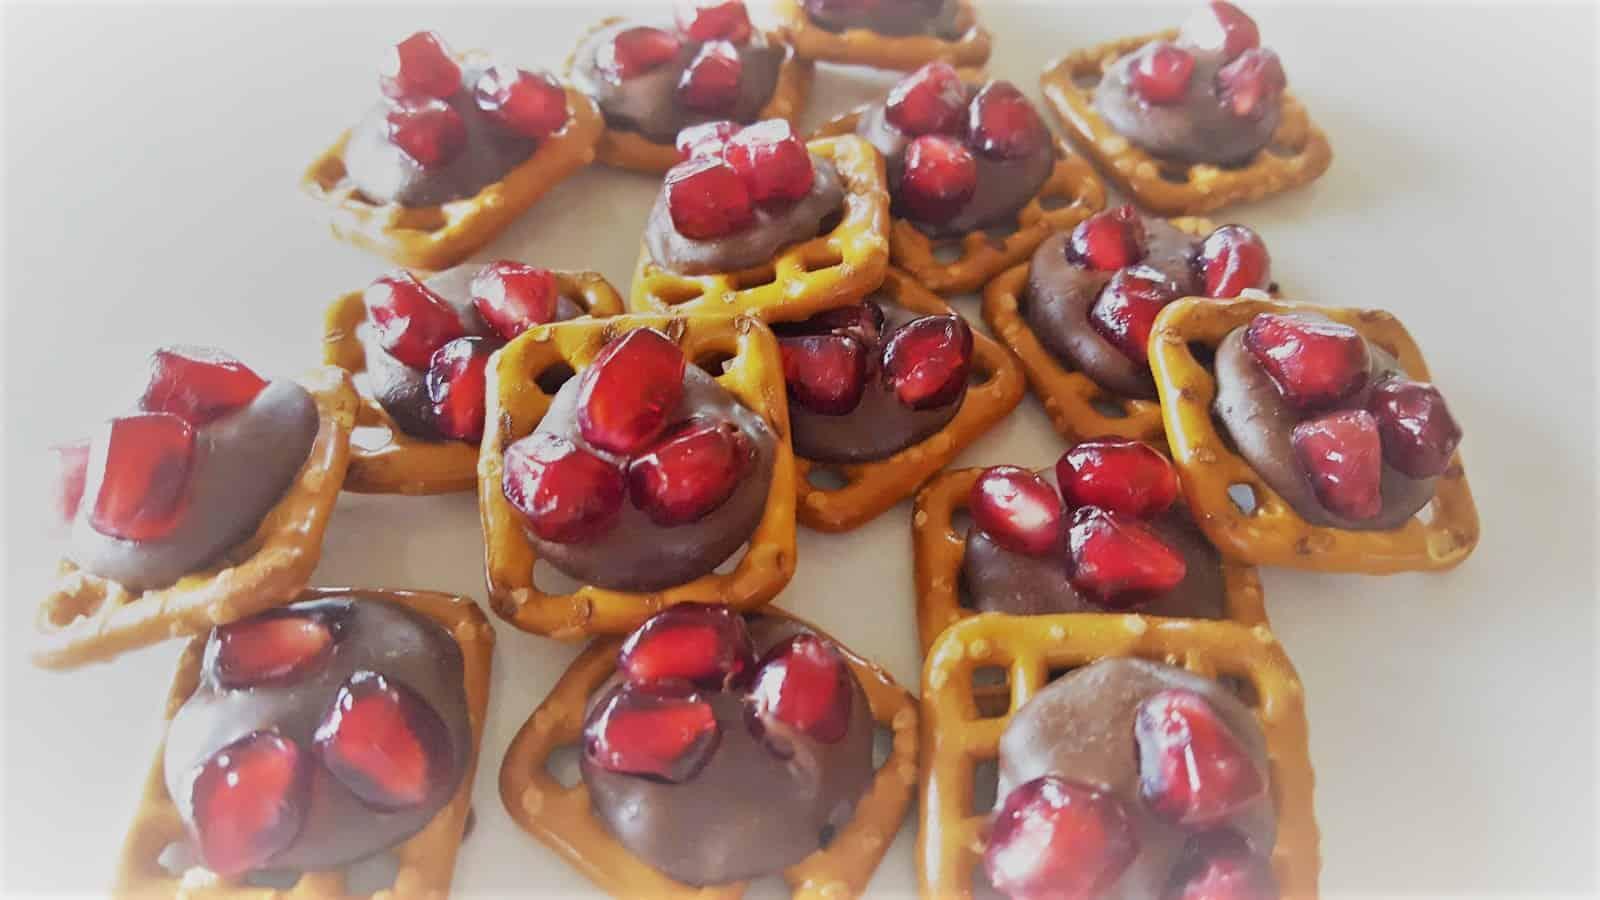 Chocolate & Peppermint Pom Pretzel Bites - Candy Cane Hershey Kisses